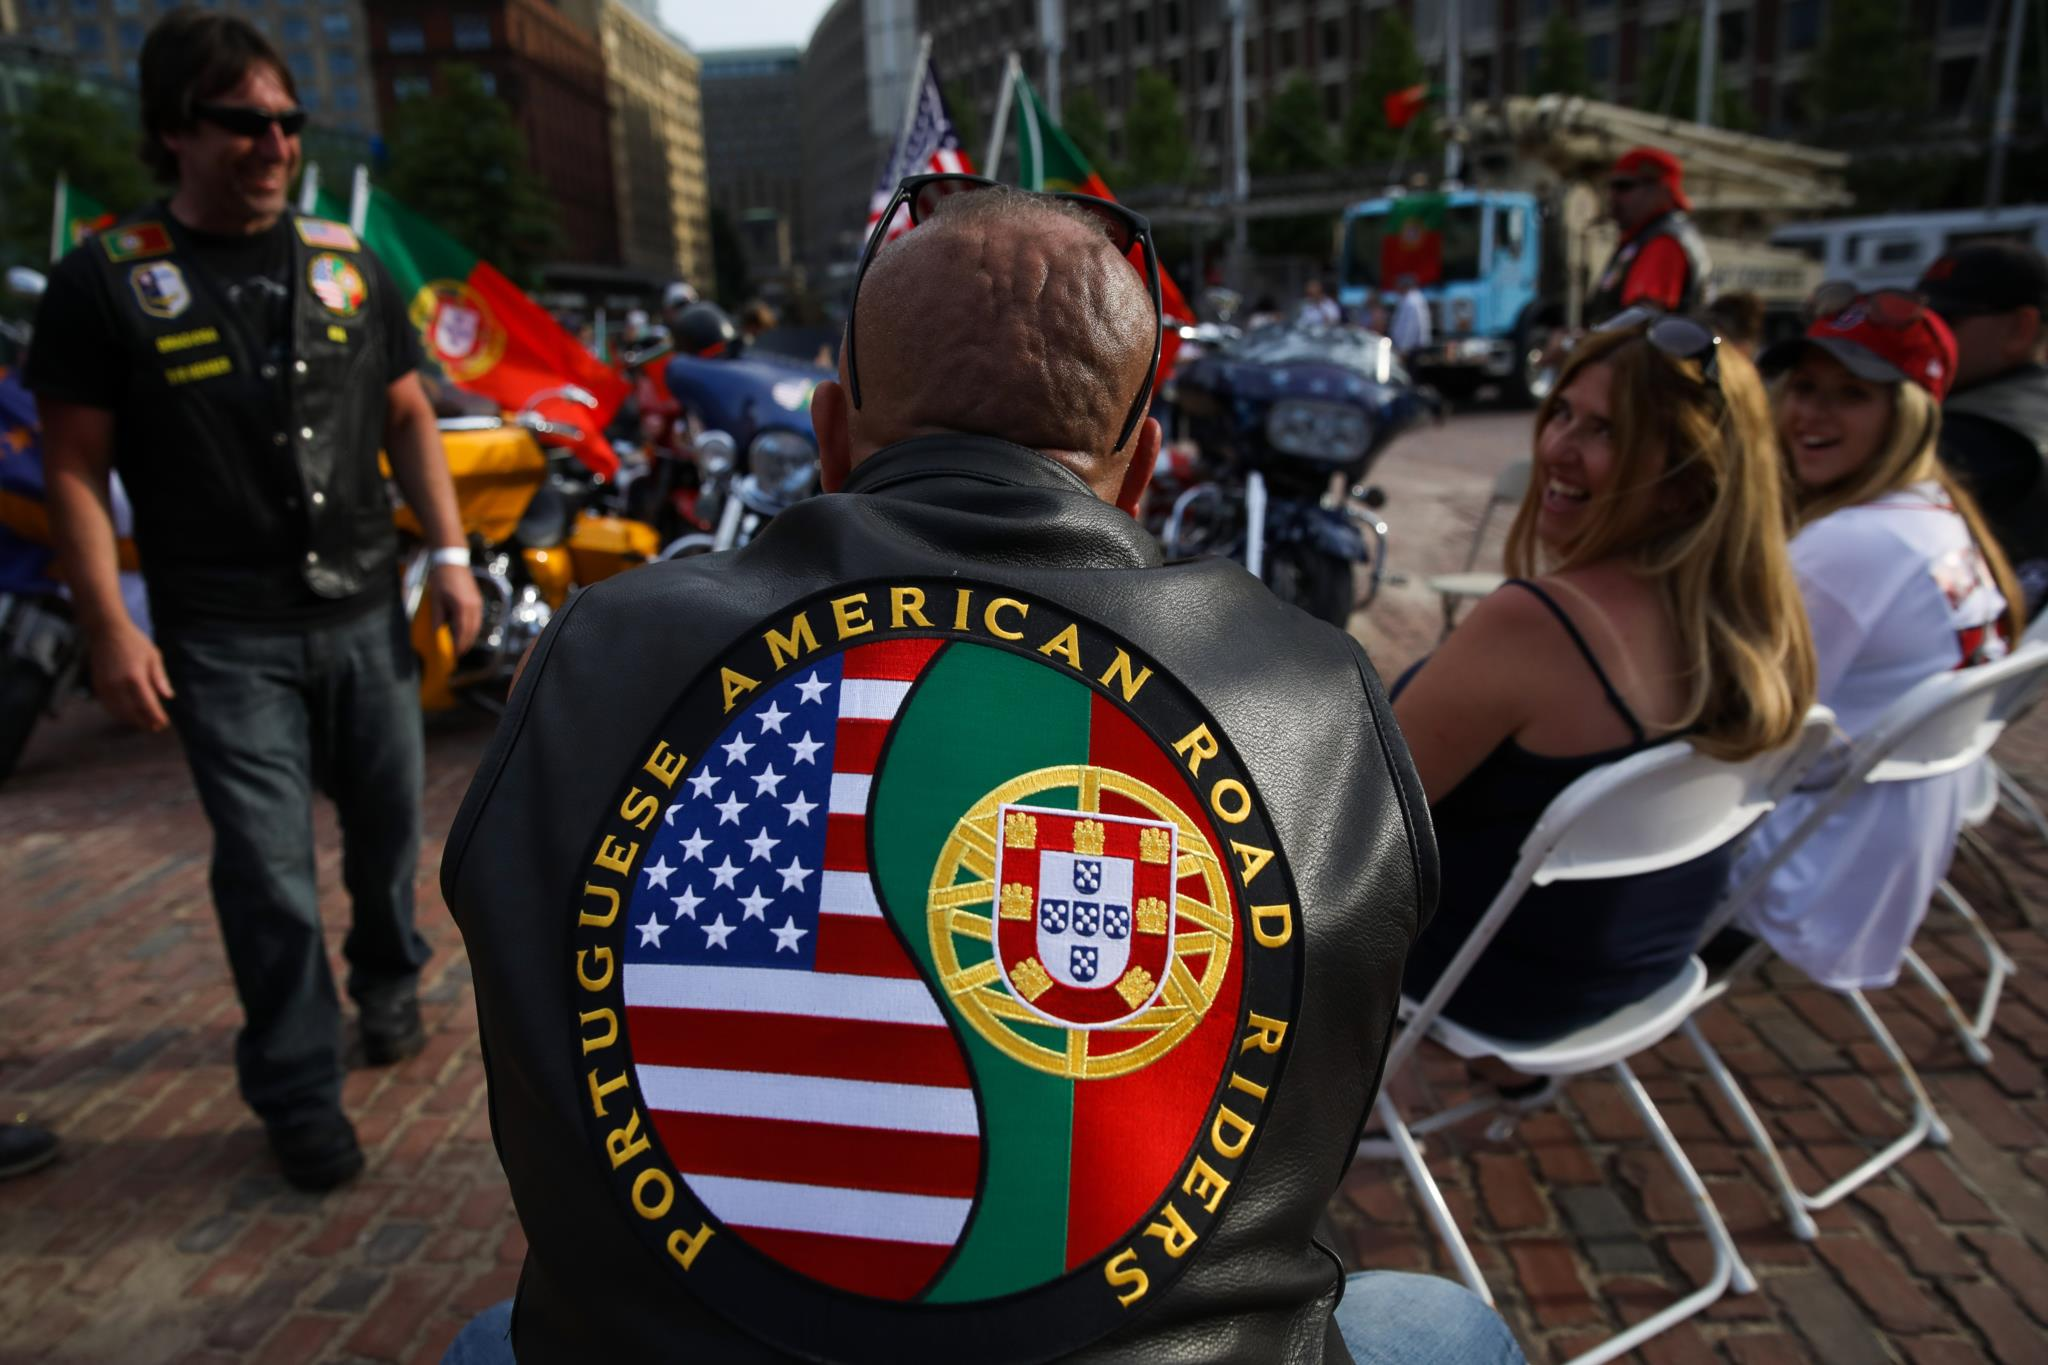 Portugueses esperaram por Marcelo Rebelo de Sousa e António Costa em Boston